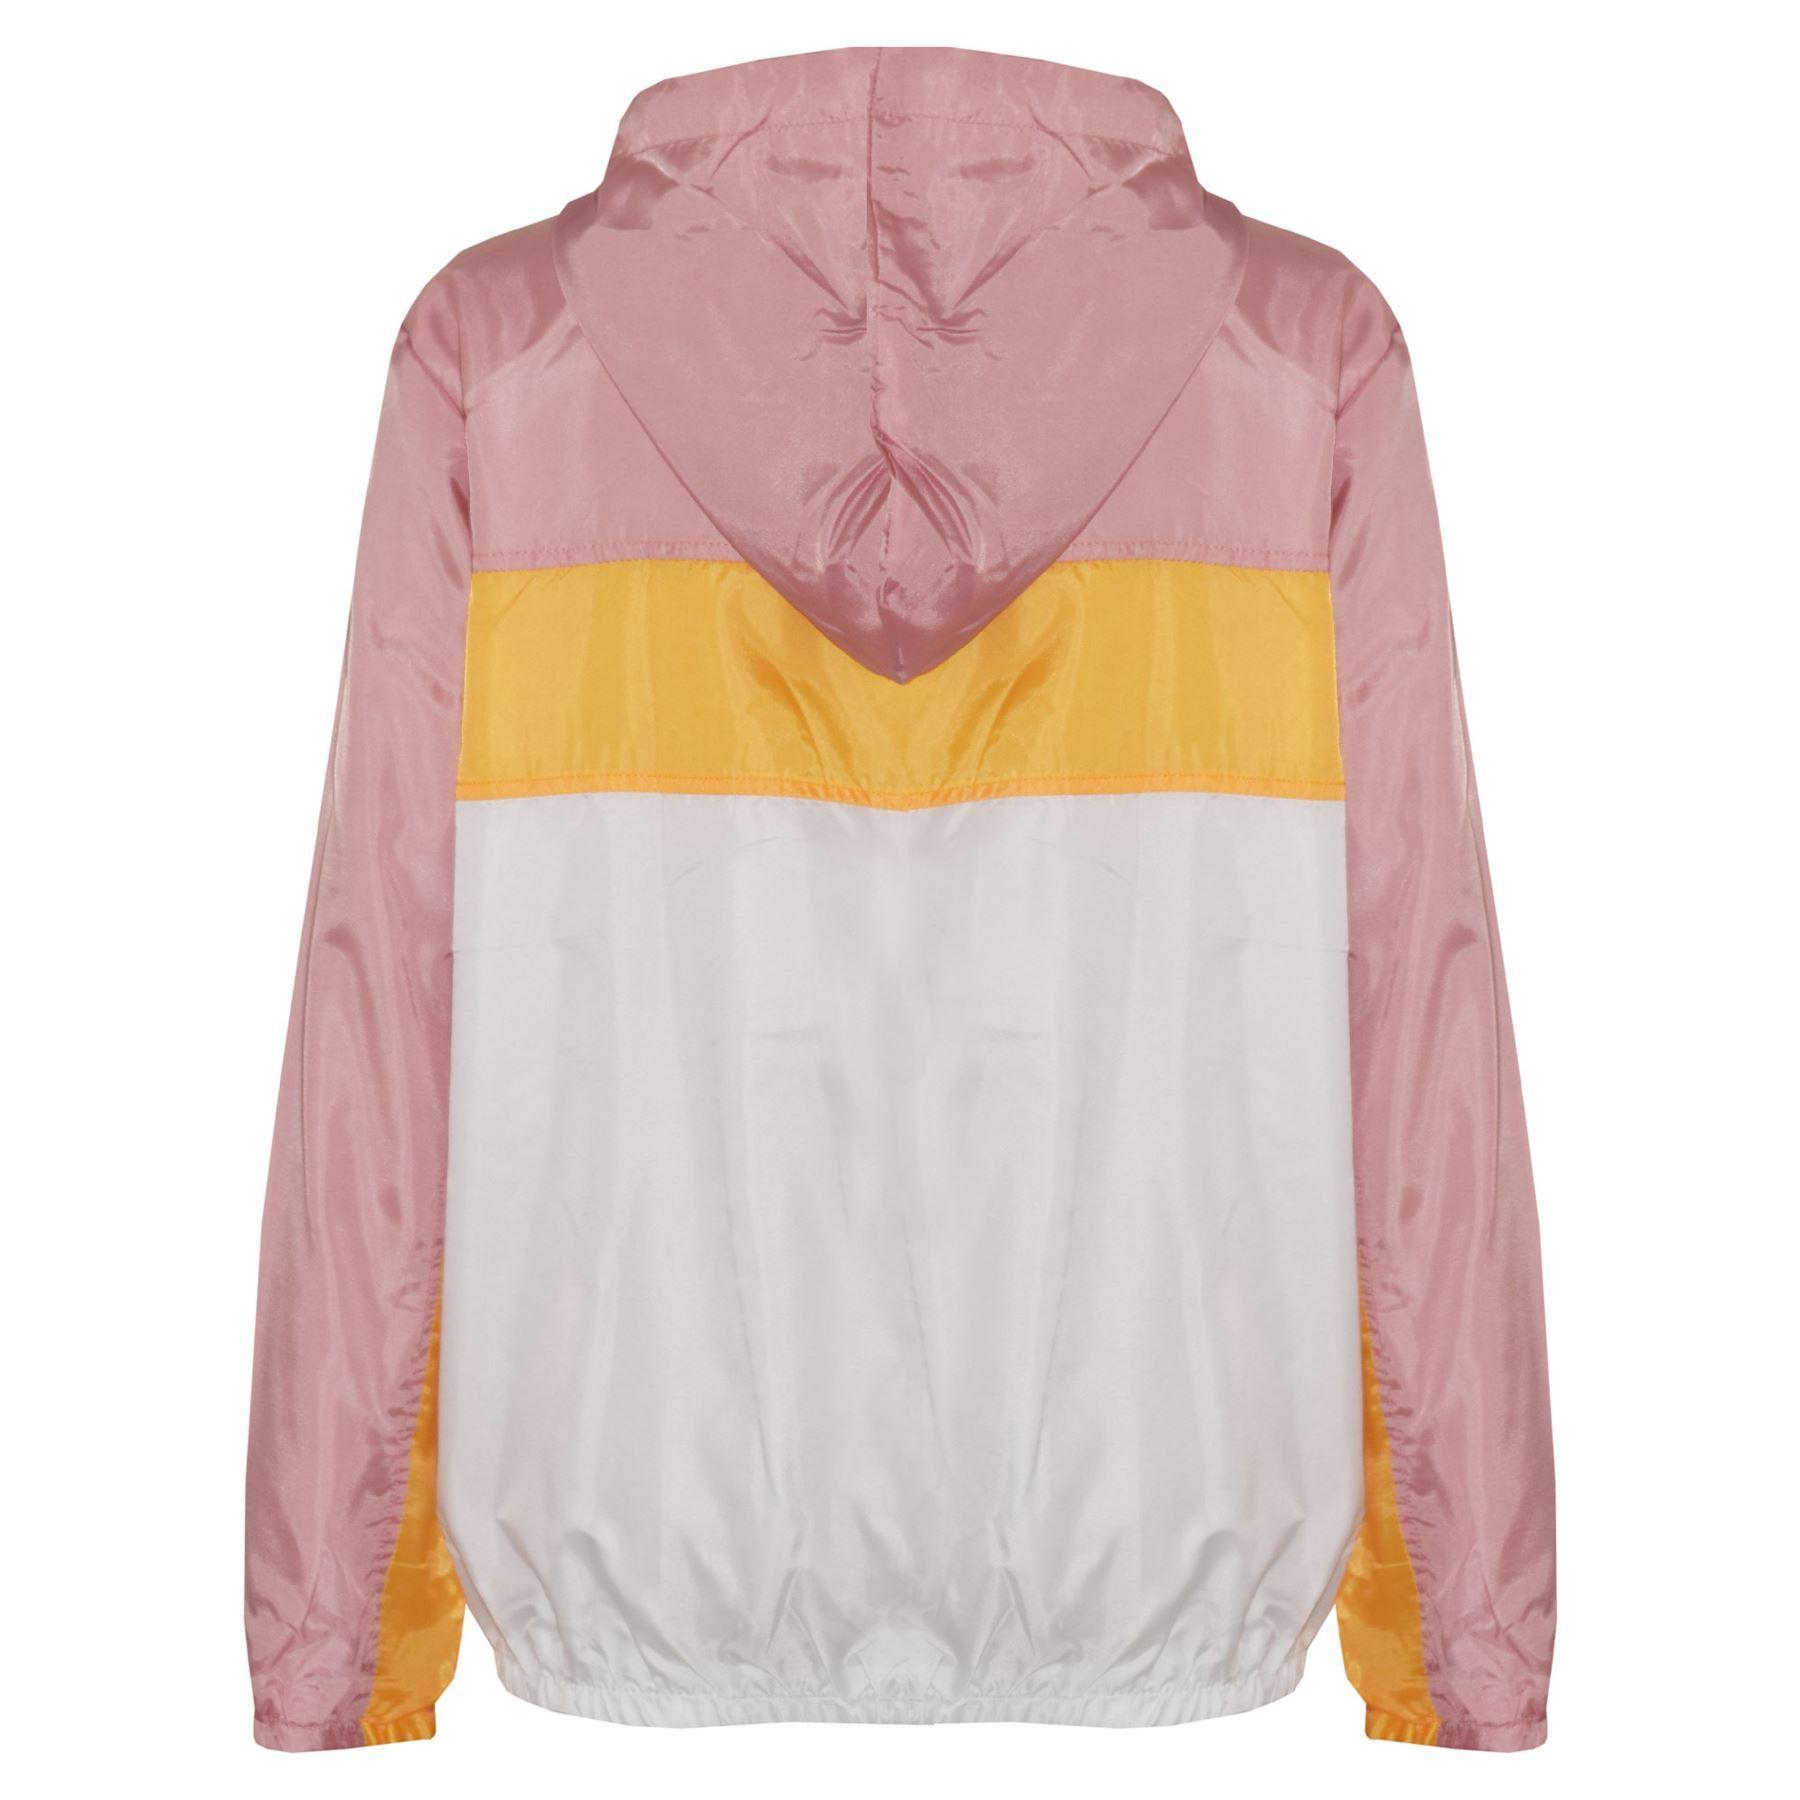 Kids-Boys-Girls-Windbreaker-Contrast-Block-Hooded-Jackets-Rain-Mac-Raincoat-5-13 thumbnail 3